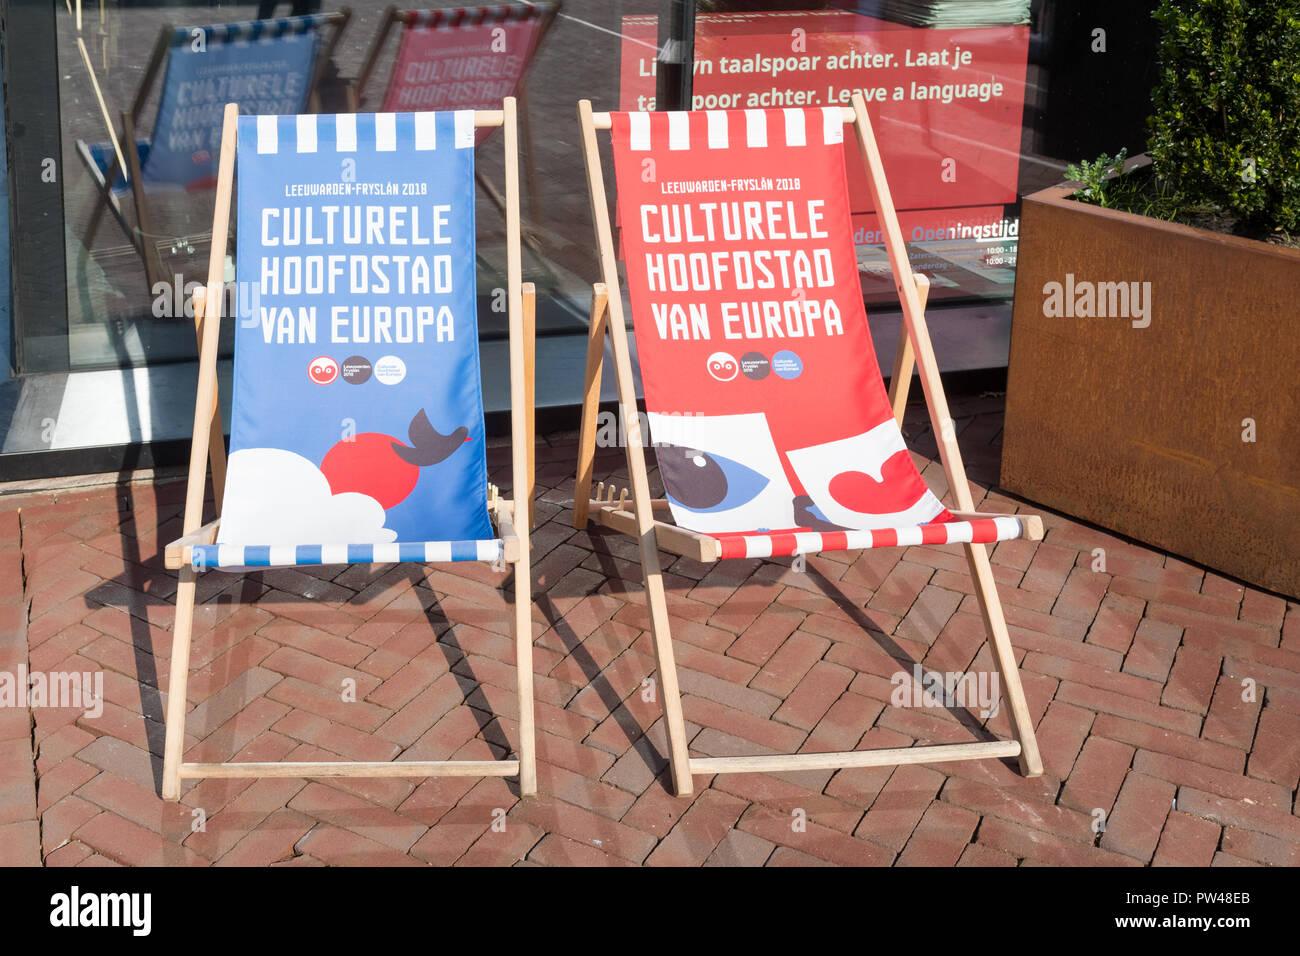 Leeuwarden, Friesland, Netherlands - European capital of culture 2018 - logo deckchairs - Stock Image